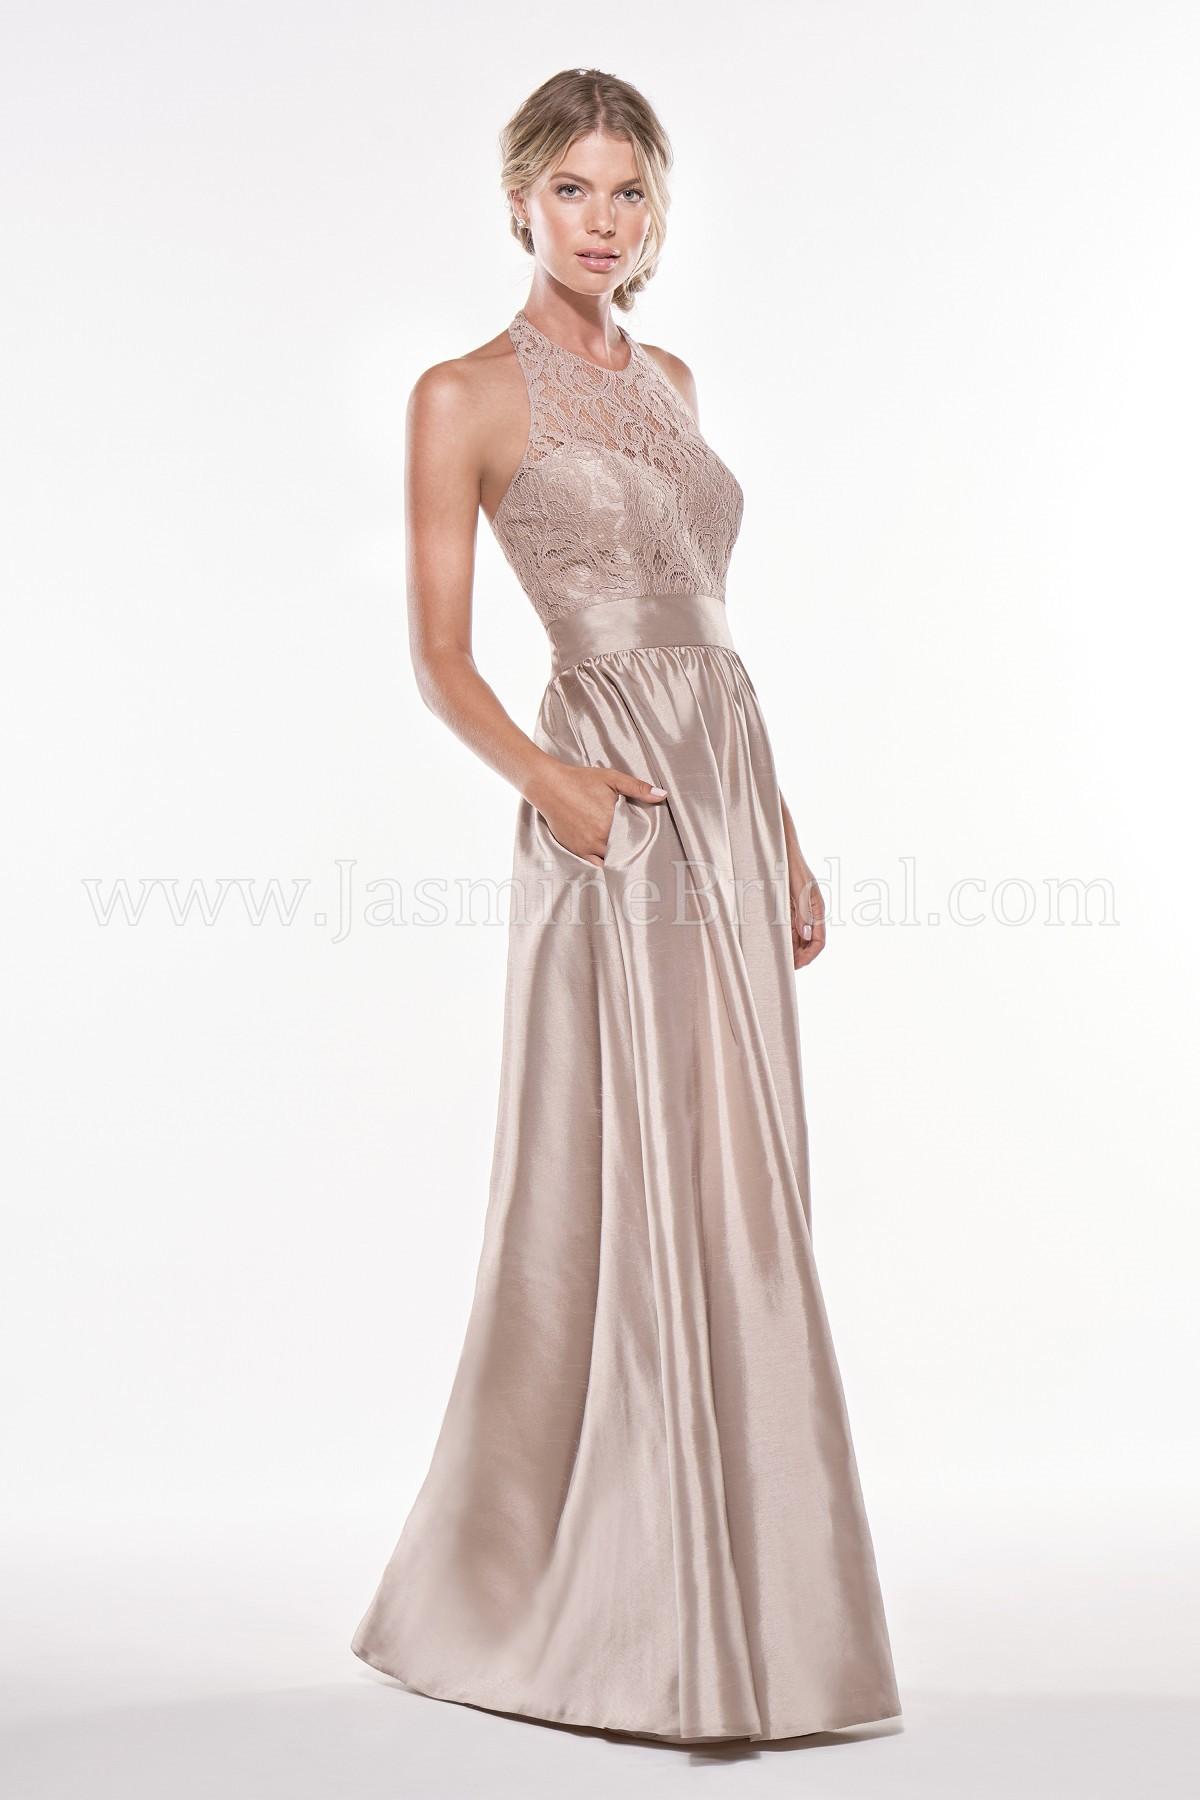 P196010 long jewel neckline lace satin back dupioni for Jewel neckline wedding dress